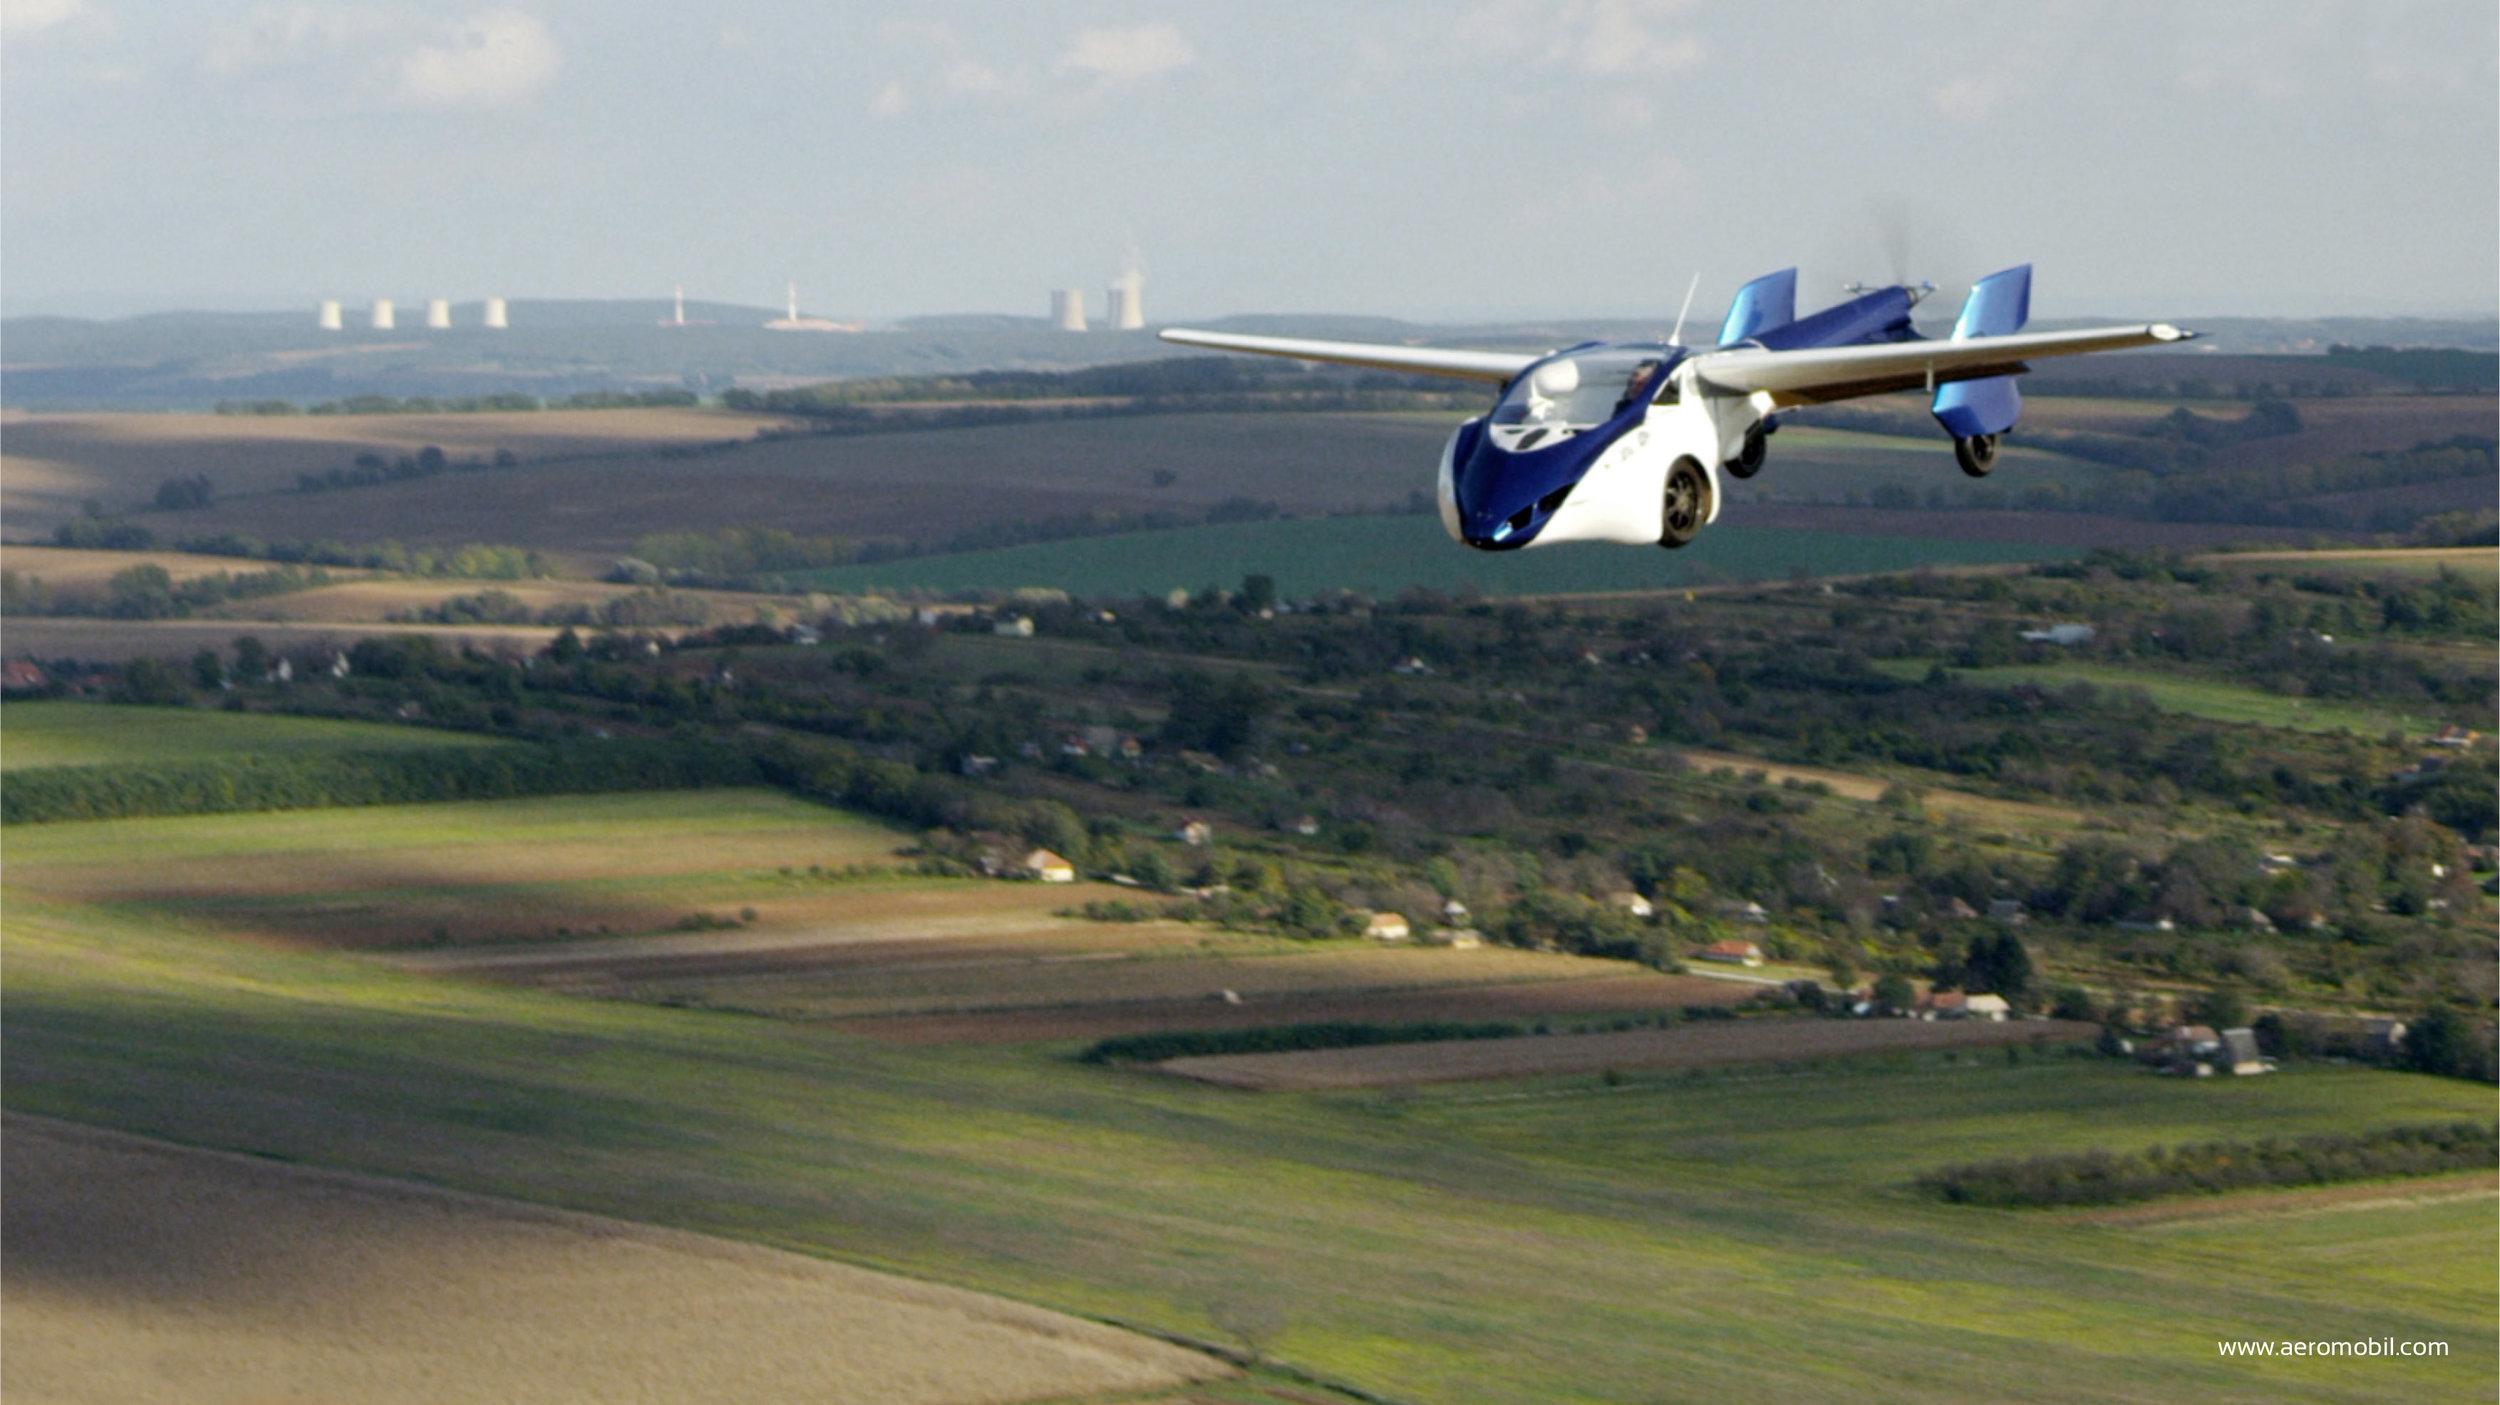 AeroMobil 3 first flight over the horizon countryside.jpg